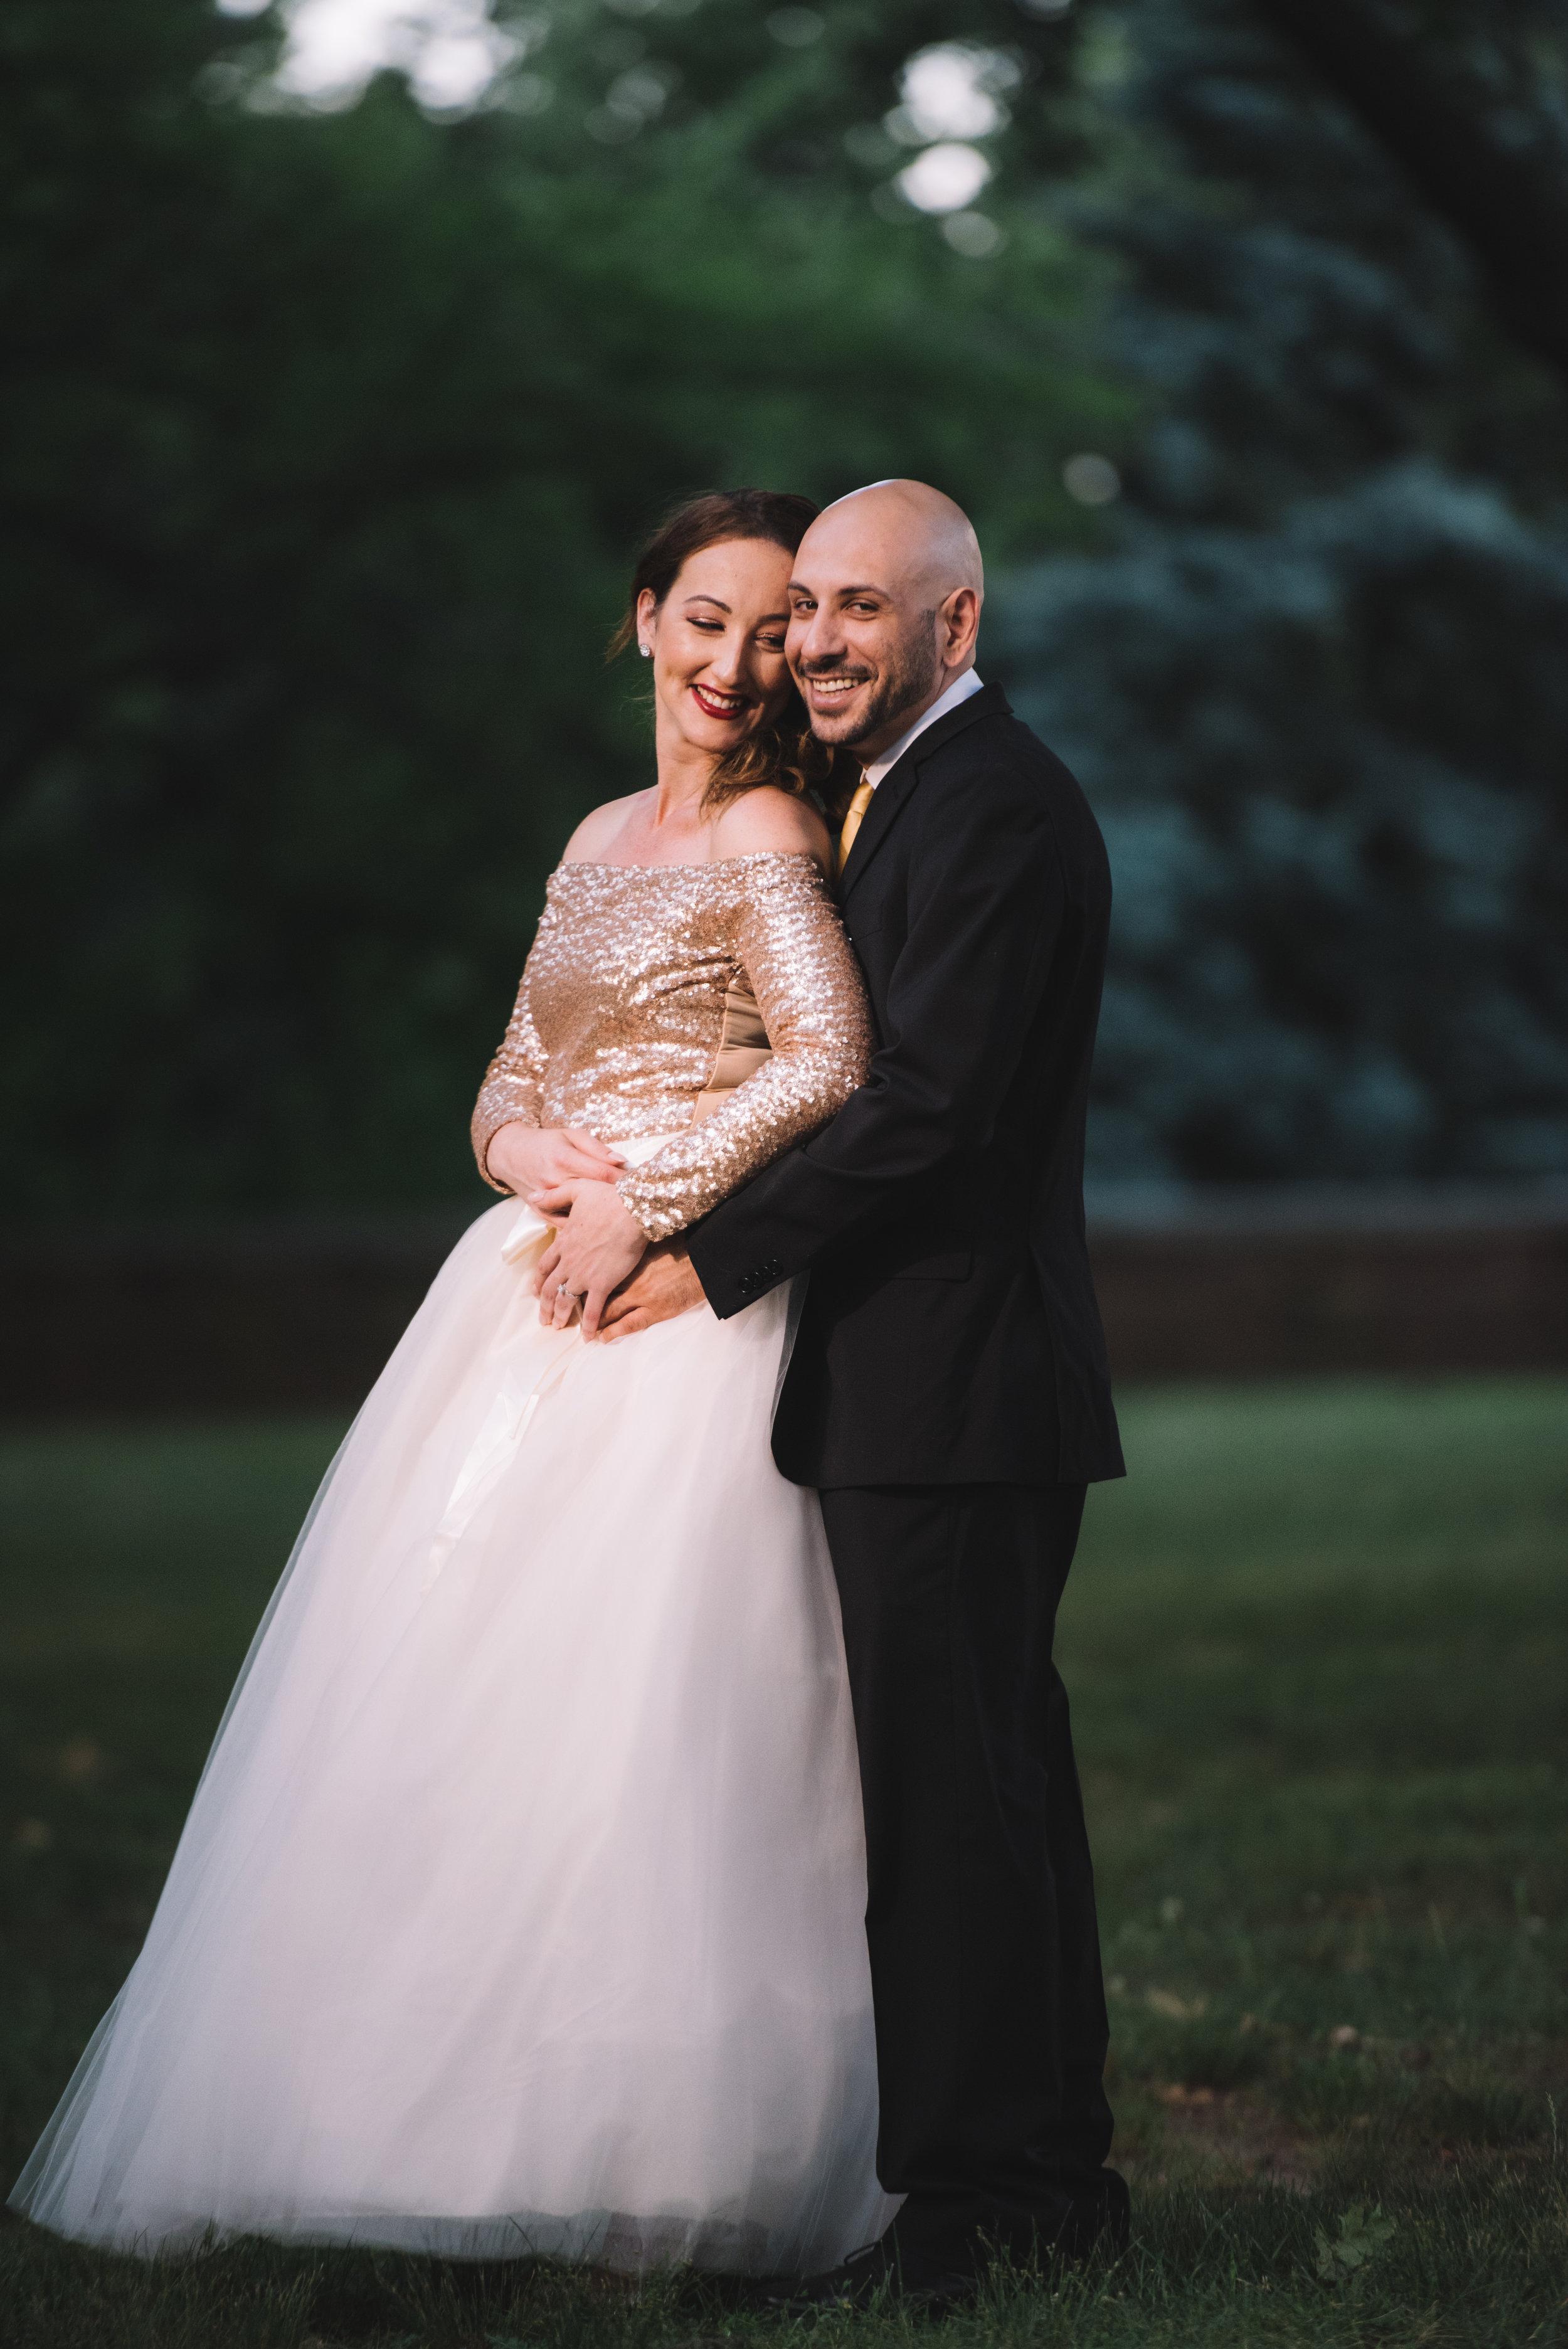 WeddingPhotos | NJPhotographer | Highlights-1-85.jpg